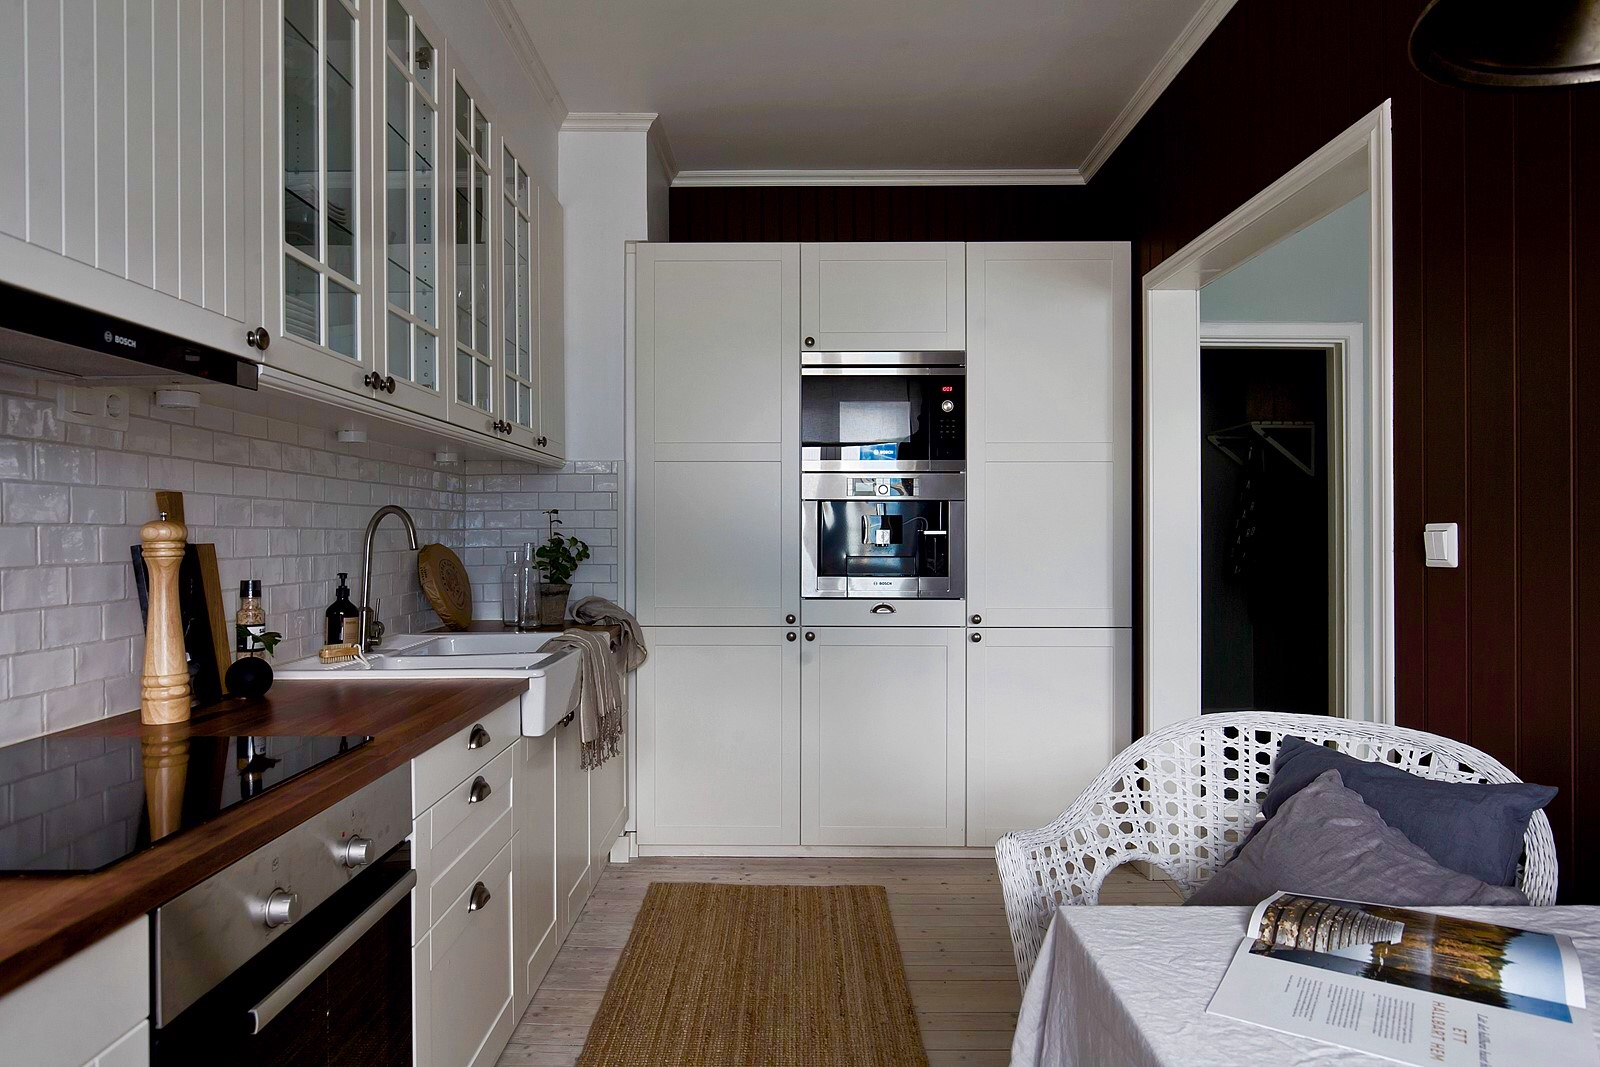 кухня шкаф встроенная техника